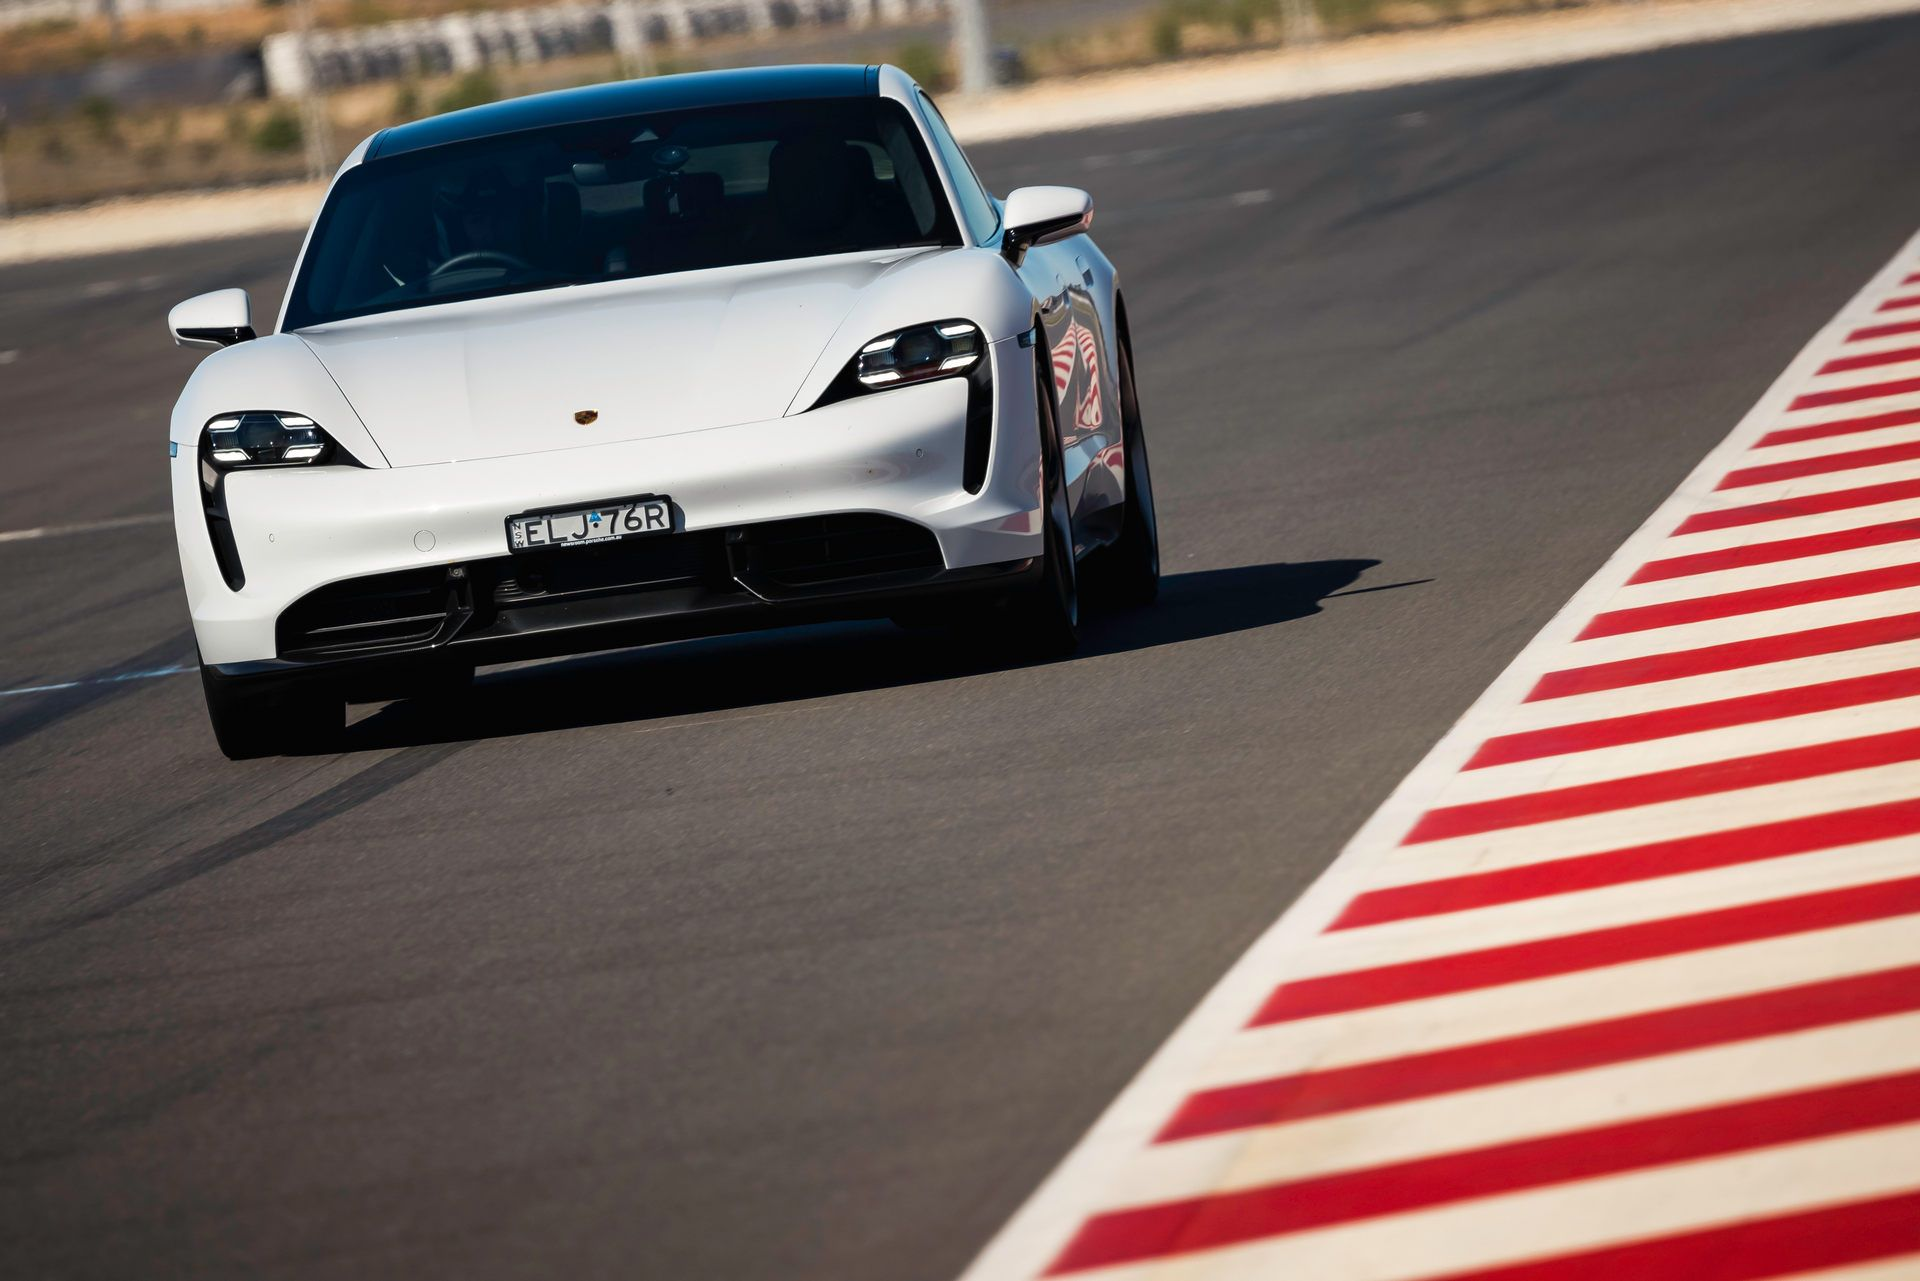 Porsche-Taycan-Turbo-S-The-Bend-Motorsport-Park-35